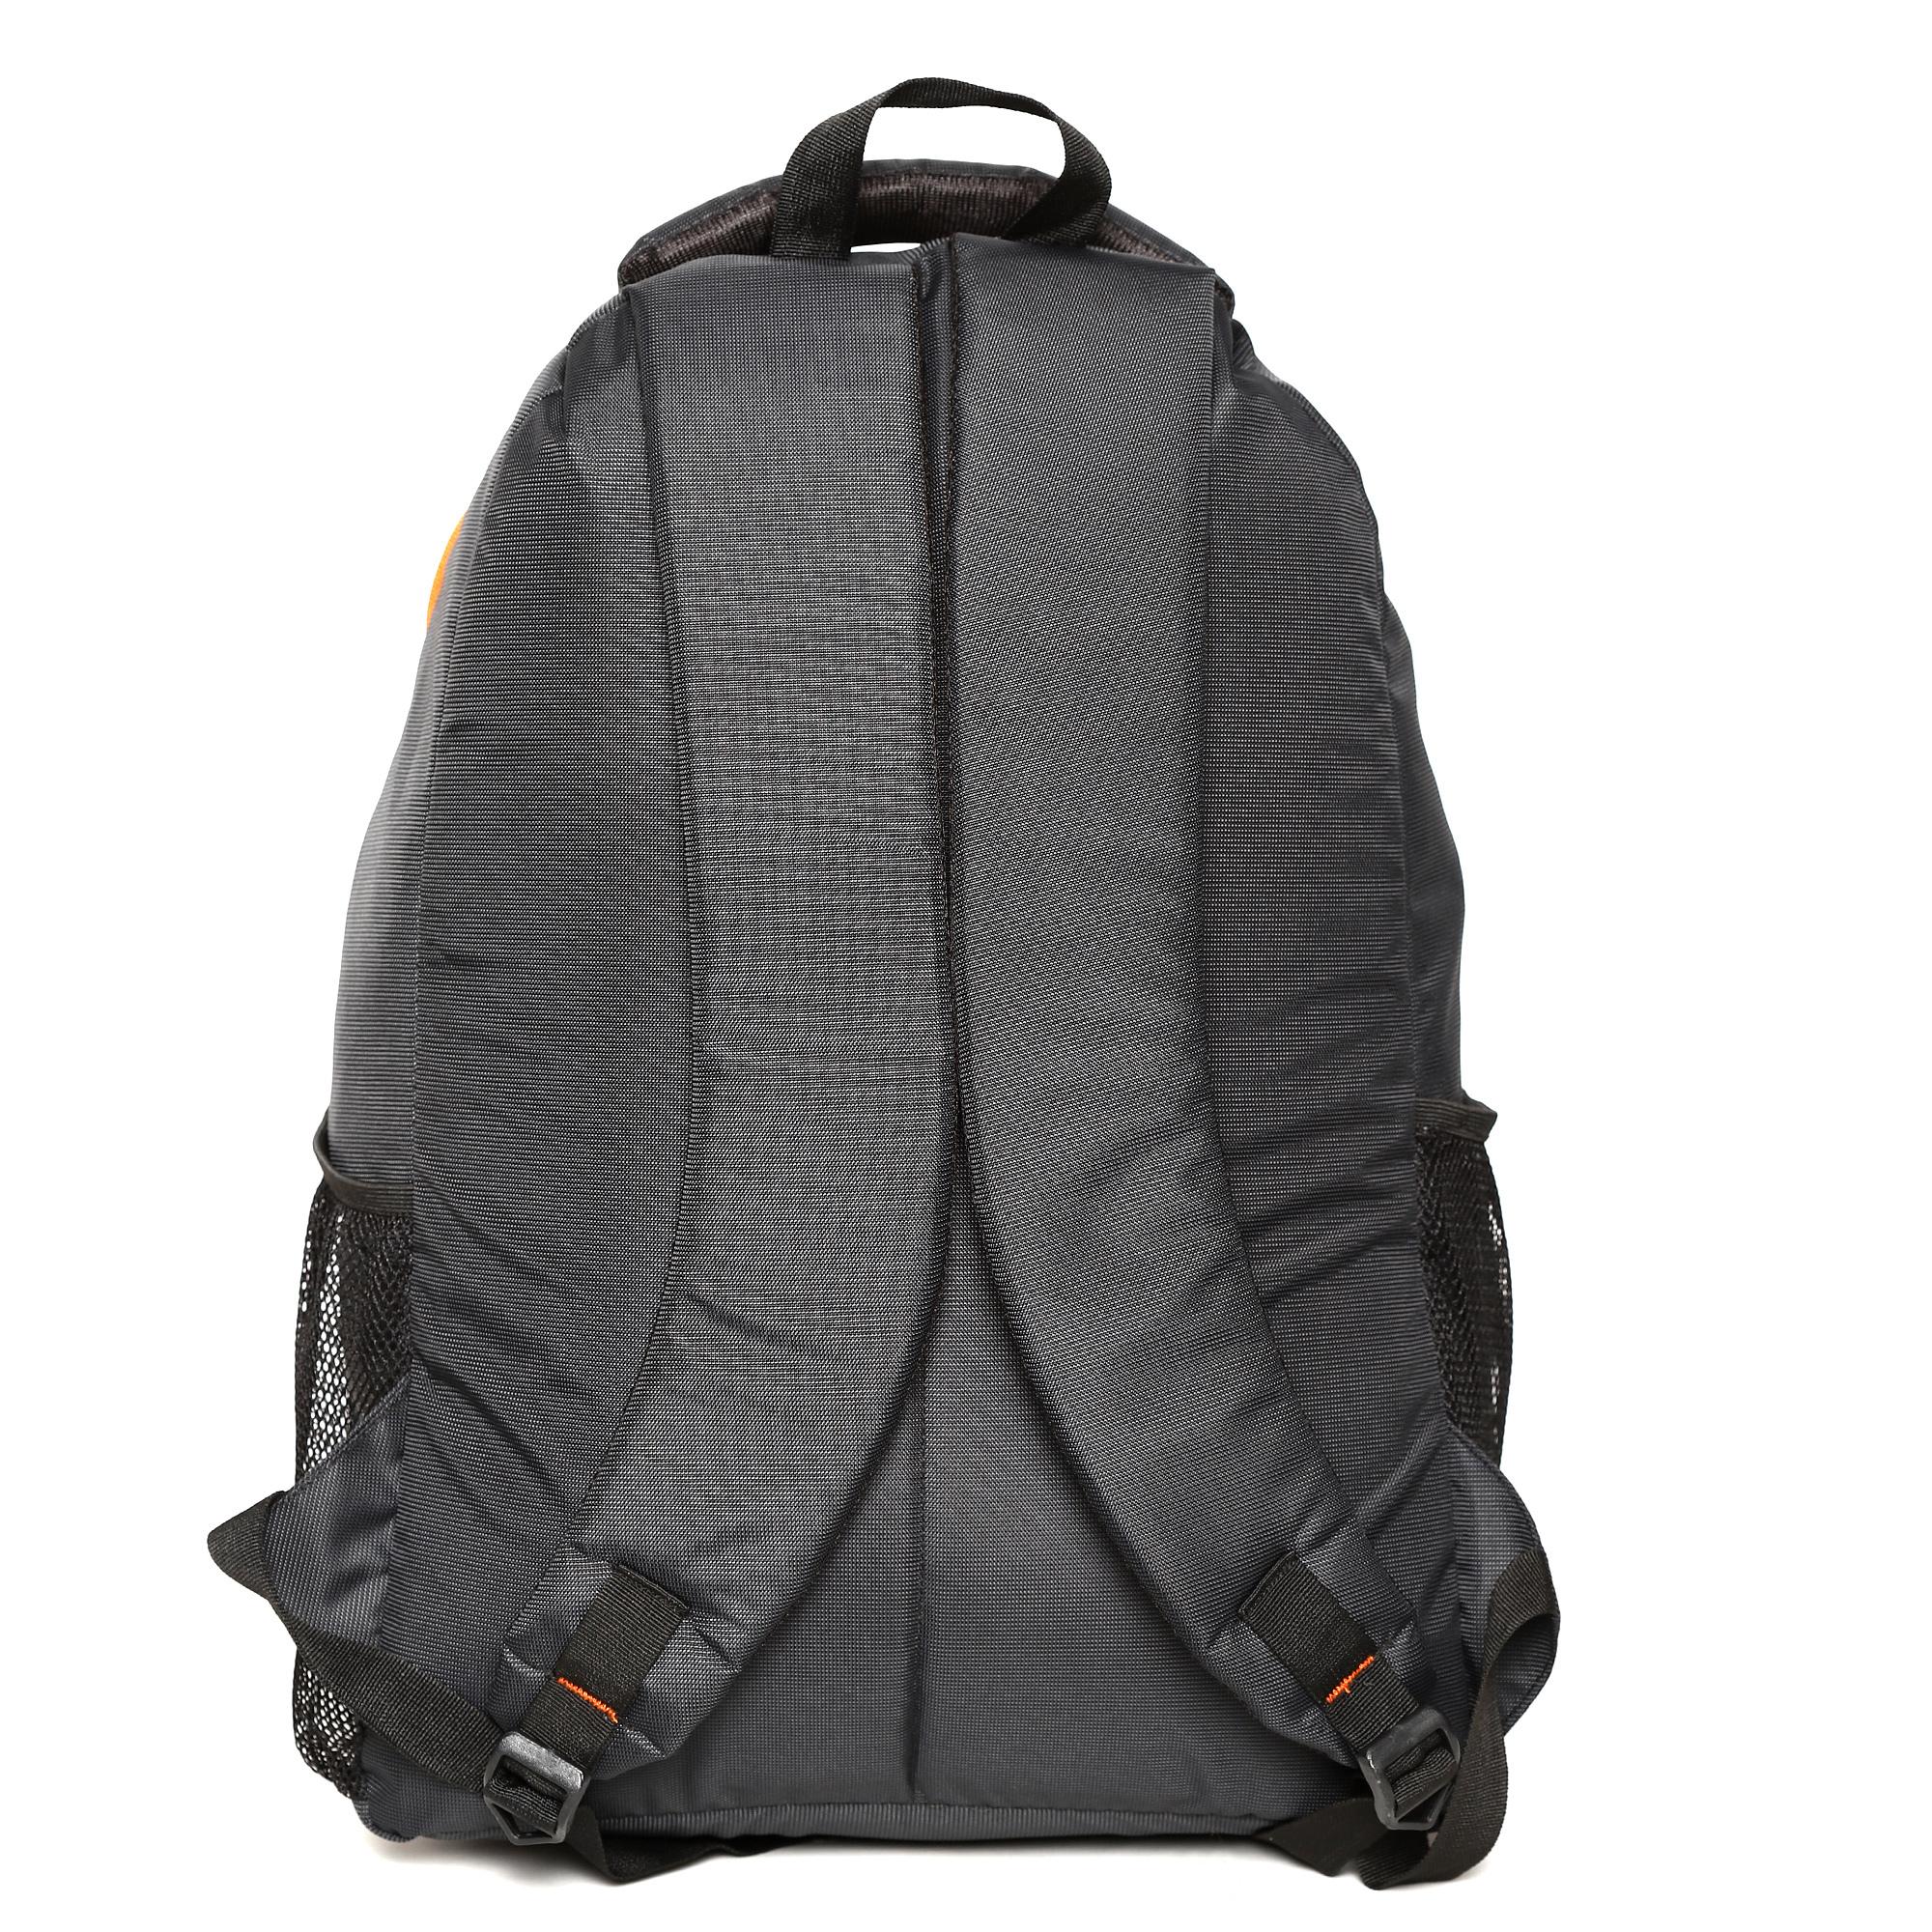 FOARA Campus 21L Black Backpack